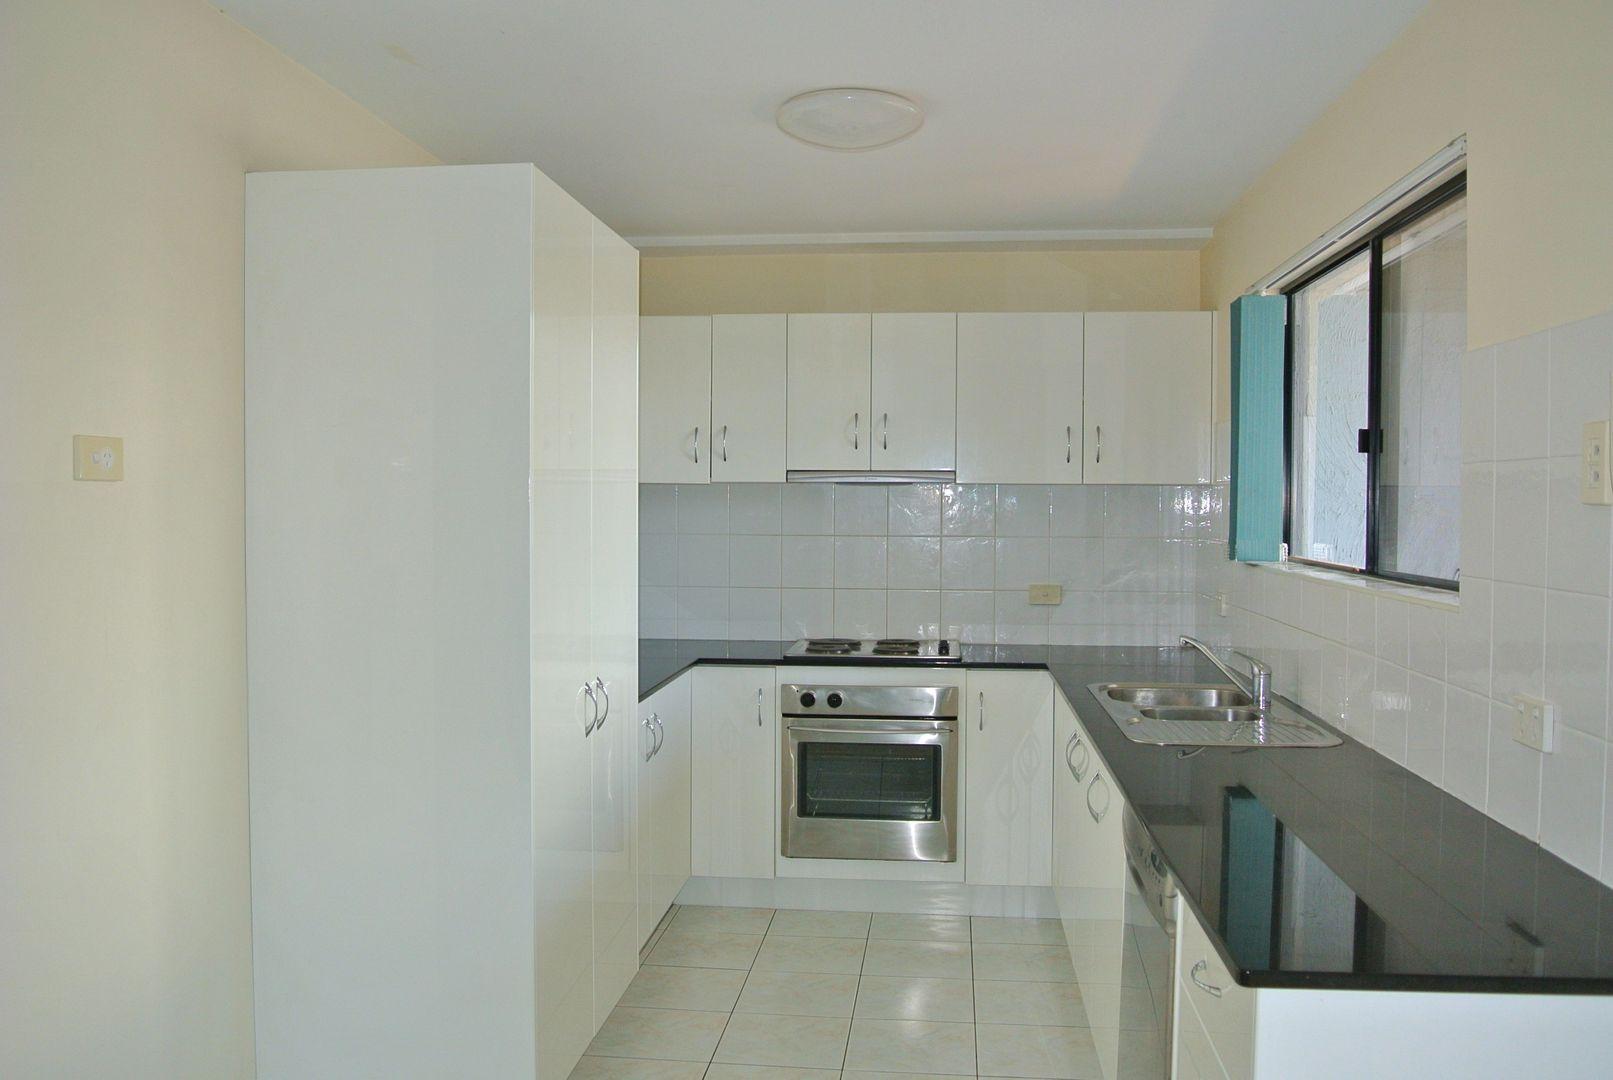 5/3 Heaslop Street, Woolloongabba QLD 4102, Image 1